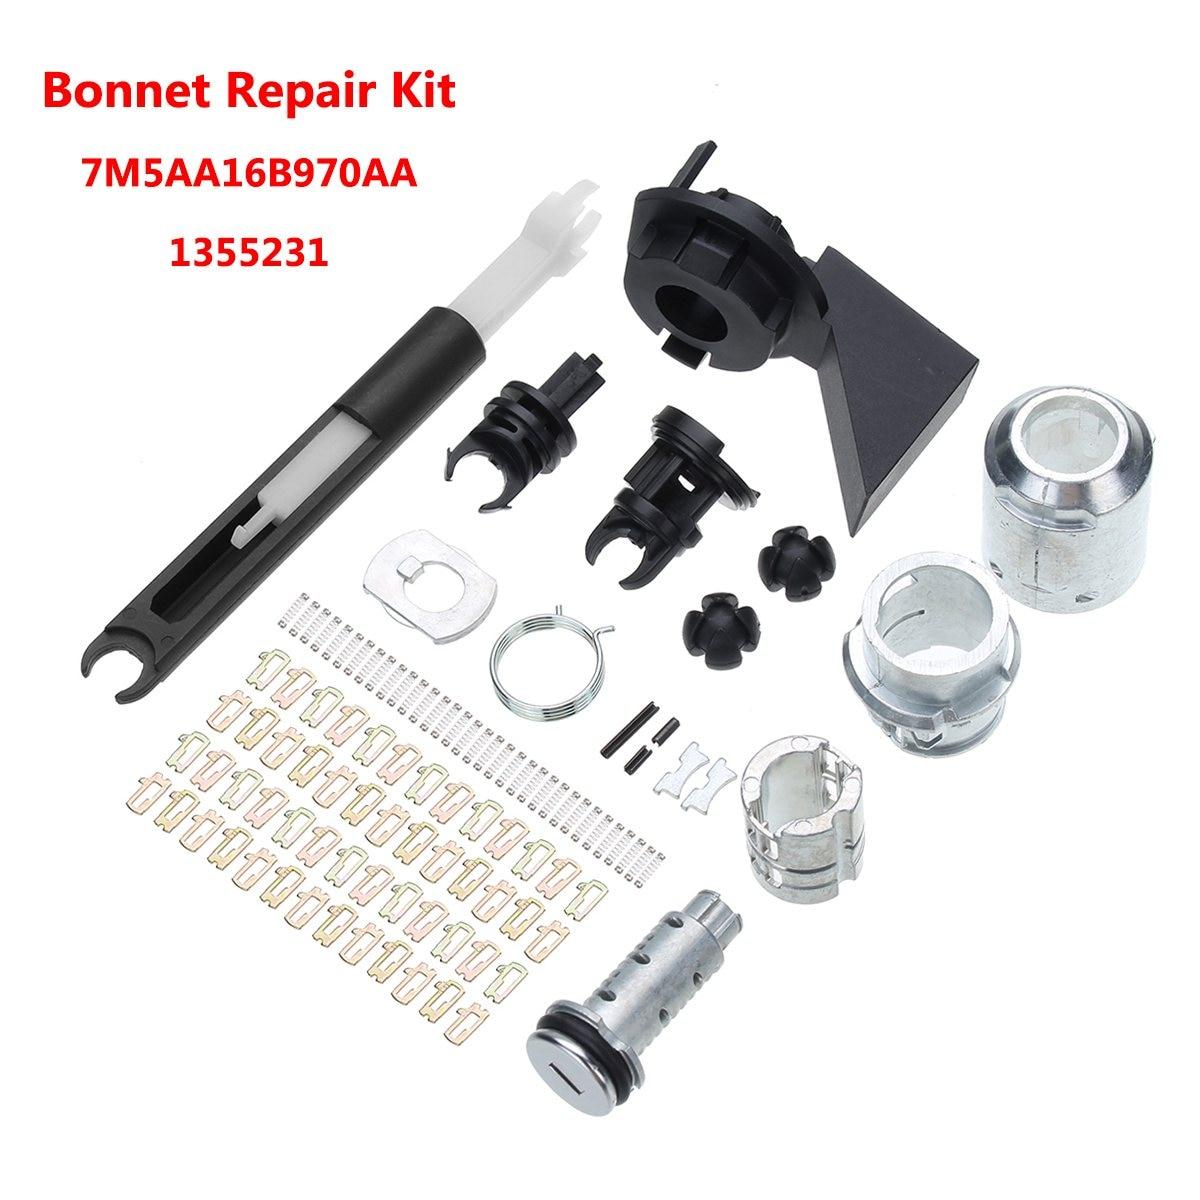 Bonnet Release Lock Repair Kit Latch Catch For Ford /Focus MK2 2004-2012 7M5AA16B970AA 1355231Bonnet Release Lock Repair Kit Latch Catch For Ford /Focus MK2 2004-2012 7M5AA16B970AA 1355231